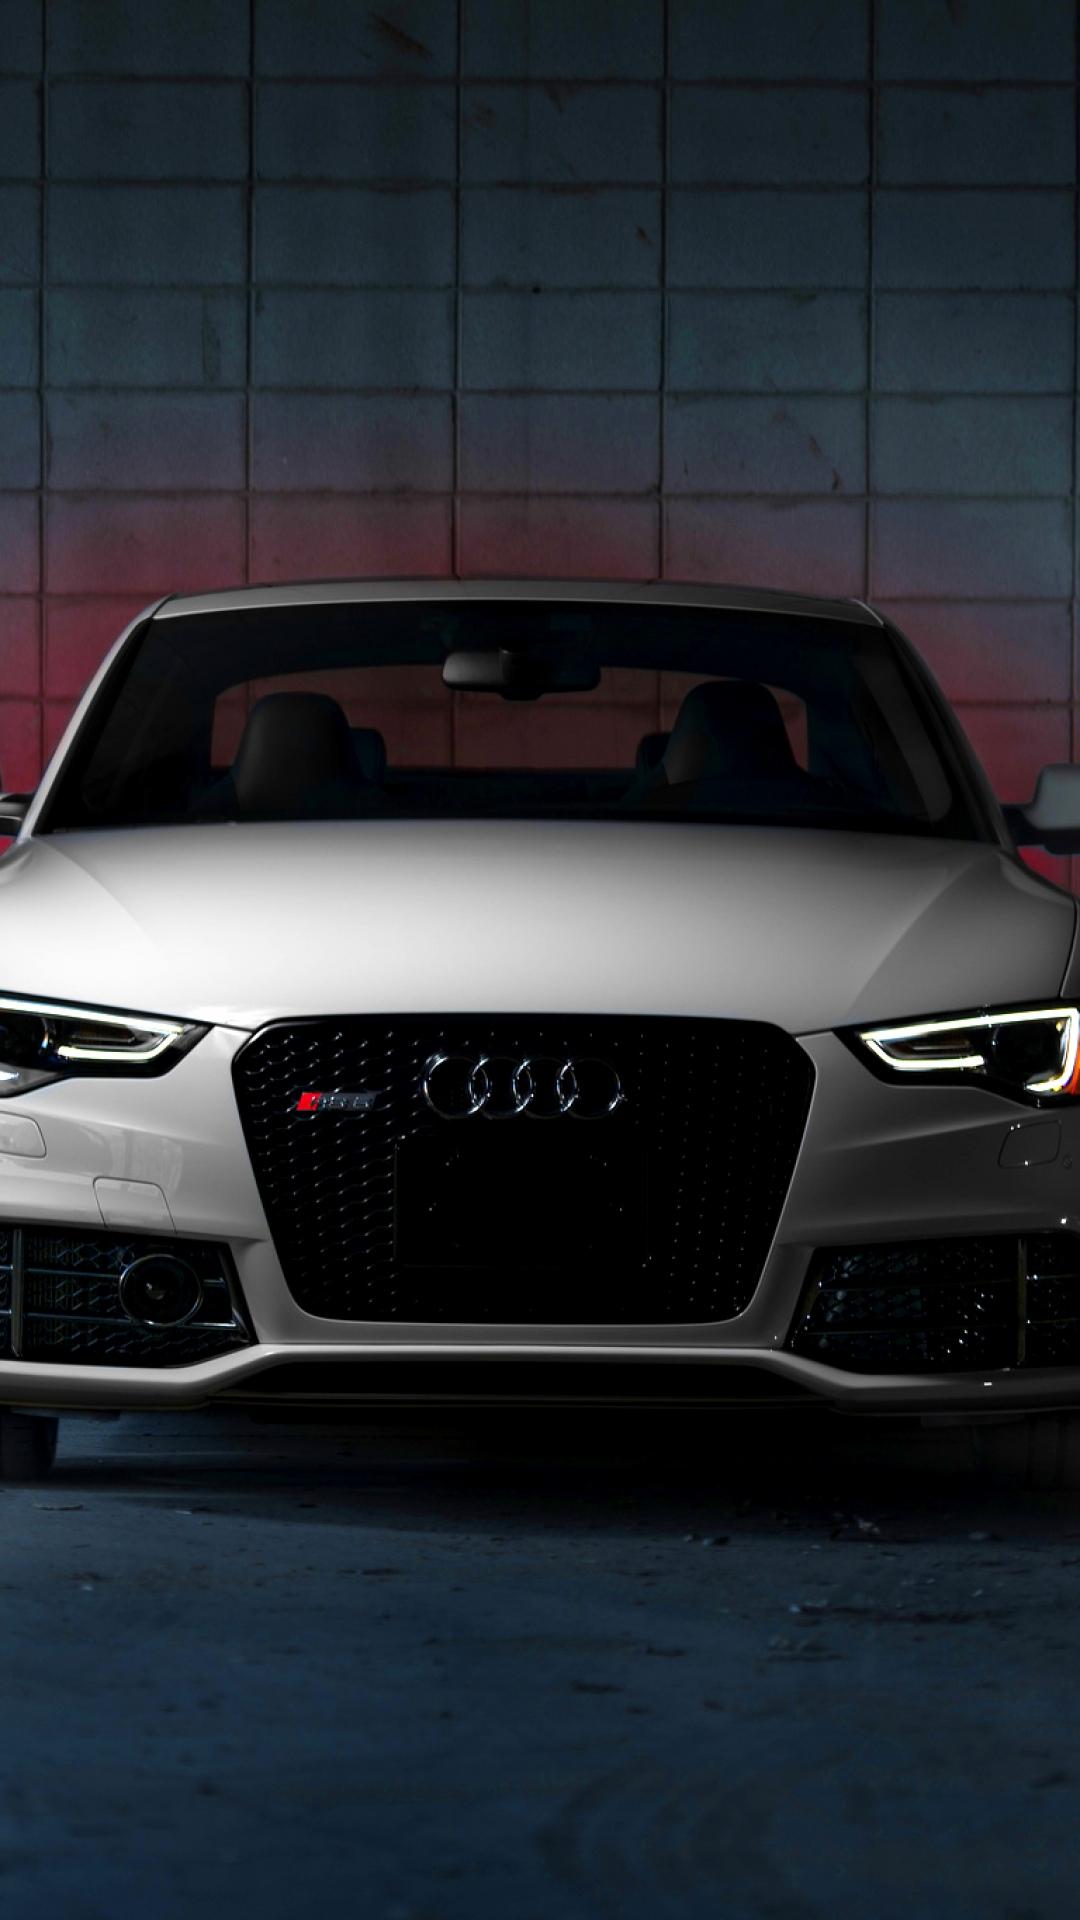 Audi Iphone Wallpaper HD